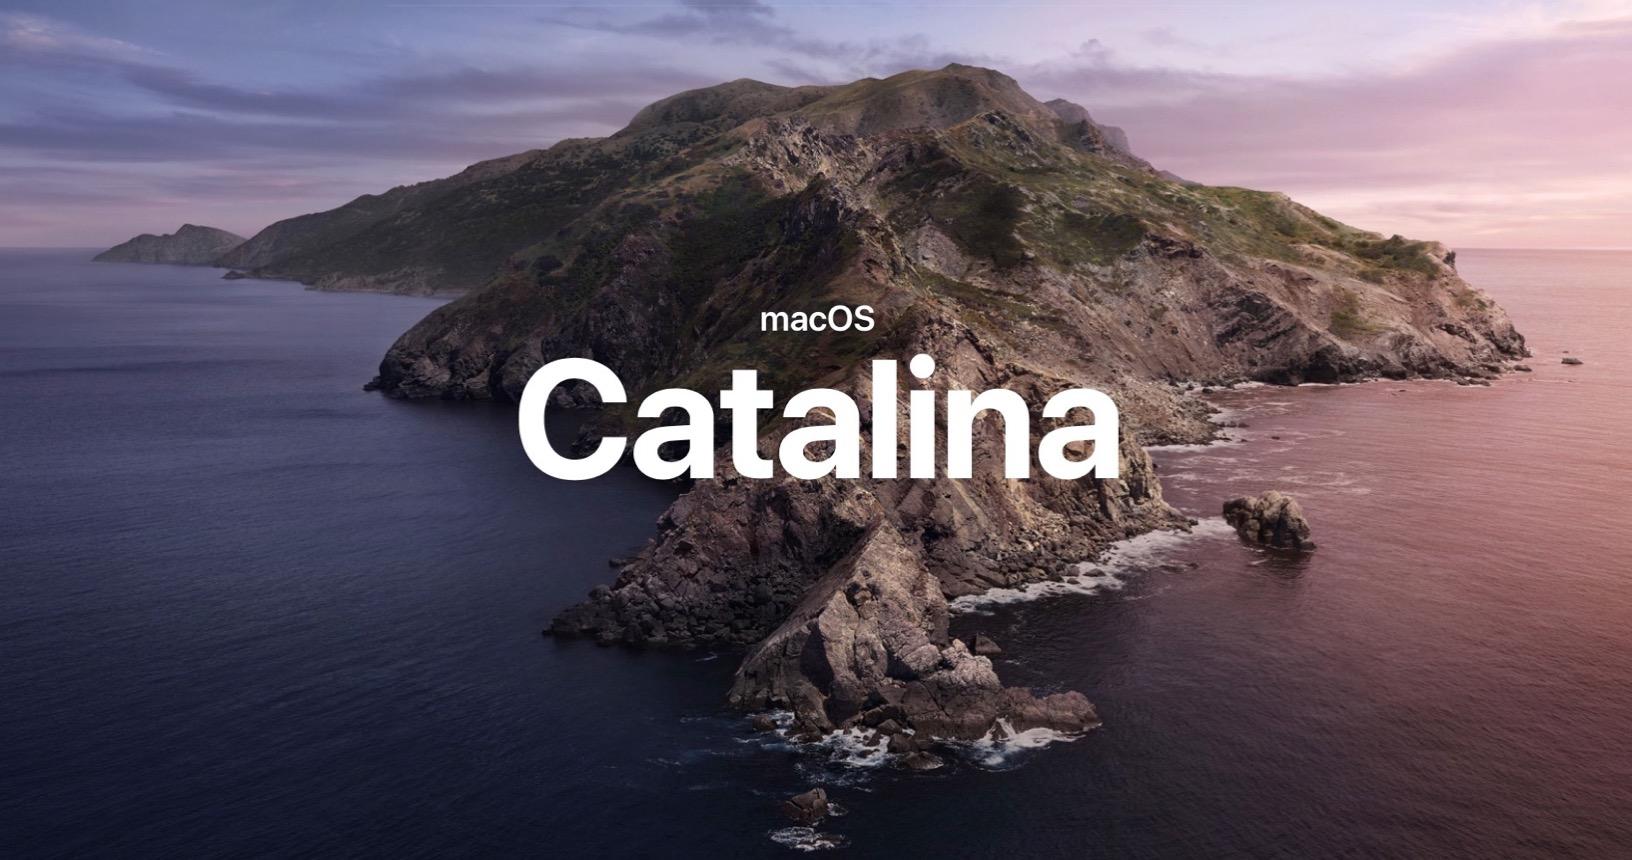 7 великих сюрпризів з безпеки у macOS 10.15 Catalina. Частина друга